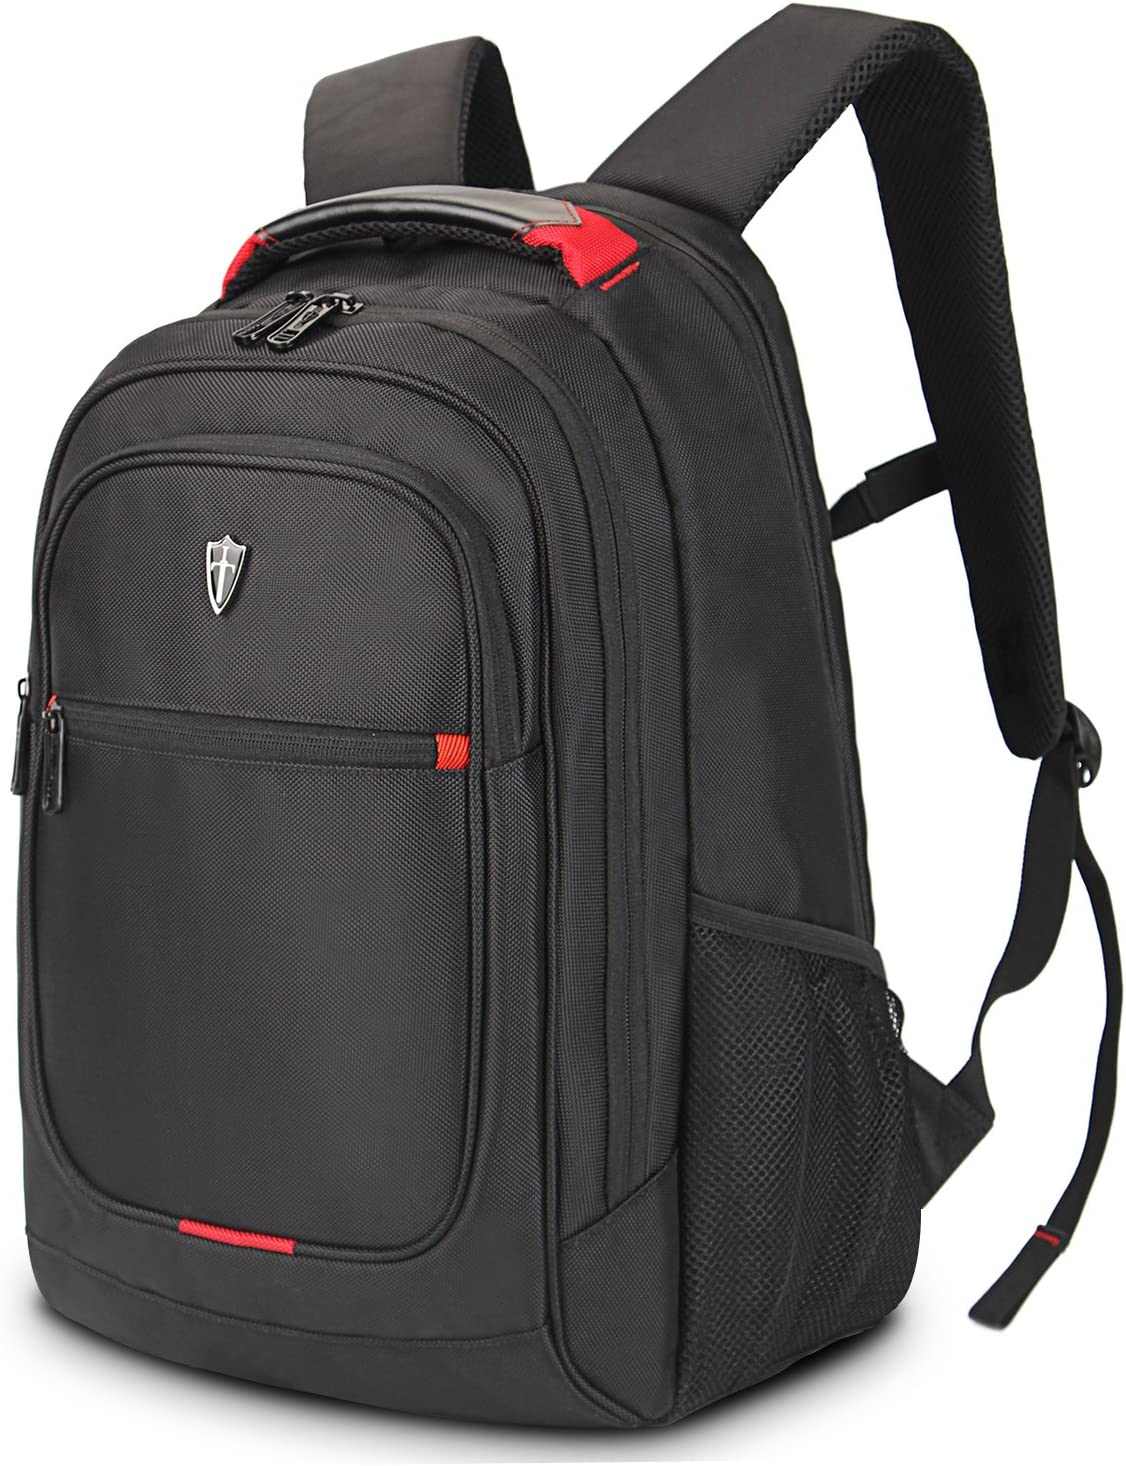 Victoriatourist V6019 Laptop Backpack College Rucksack Business Travel Hiking Daypack Fits MacBook Pro Most 15 Laptops, Black